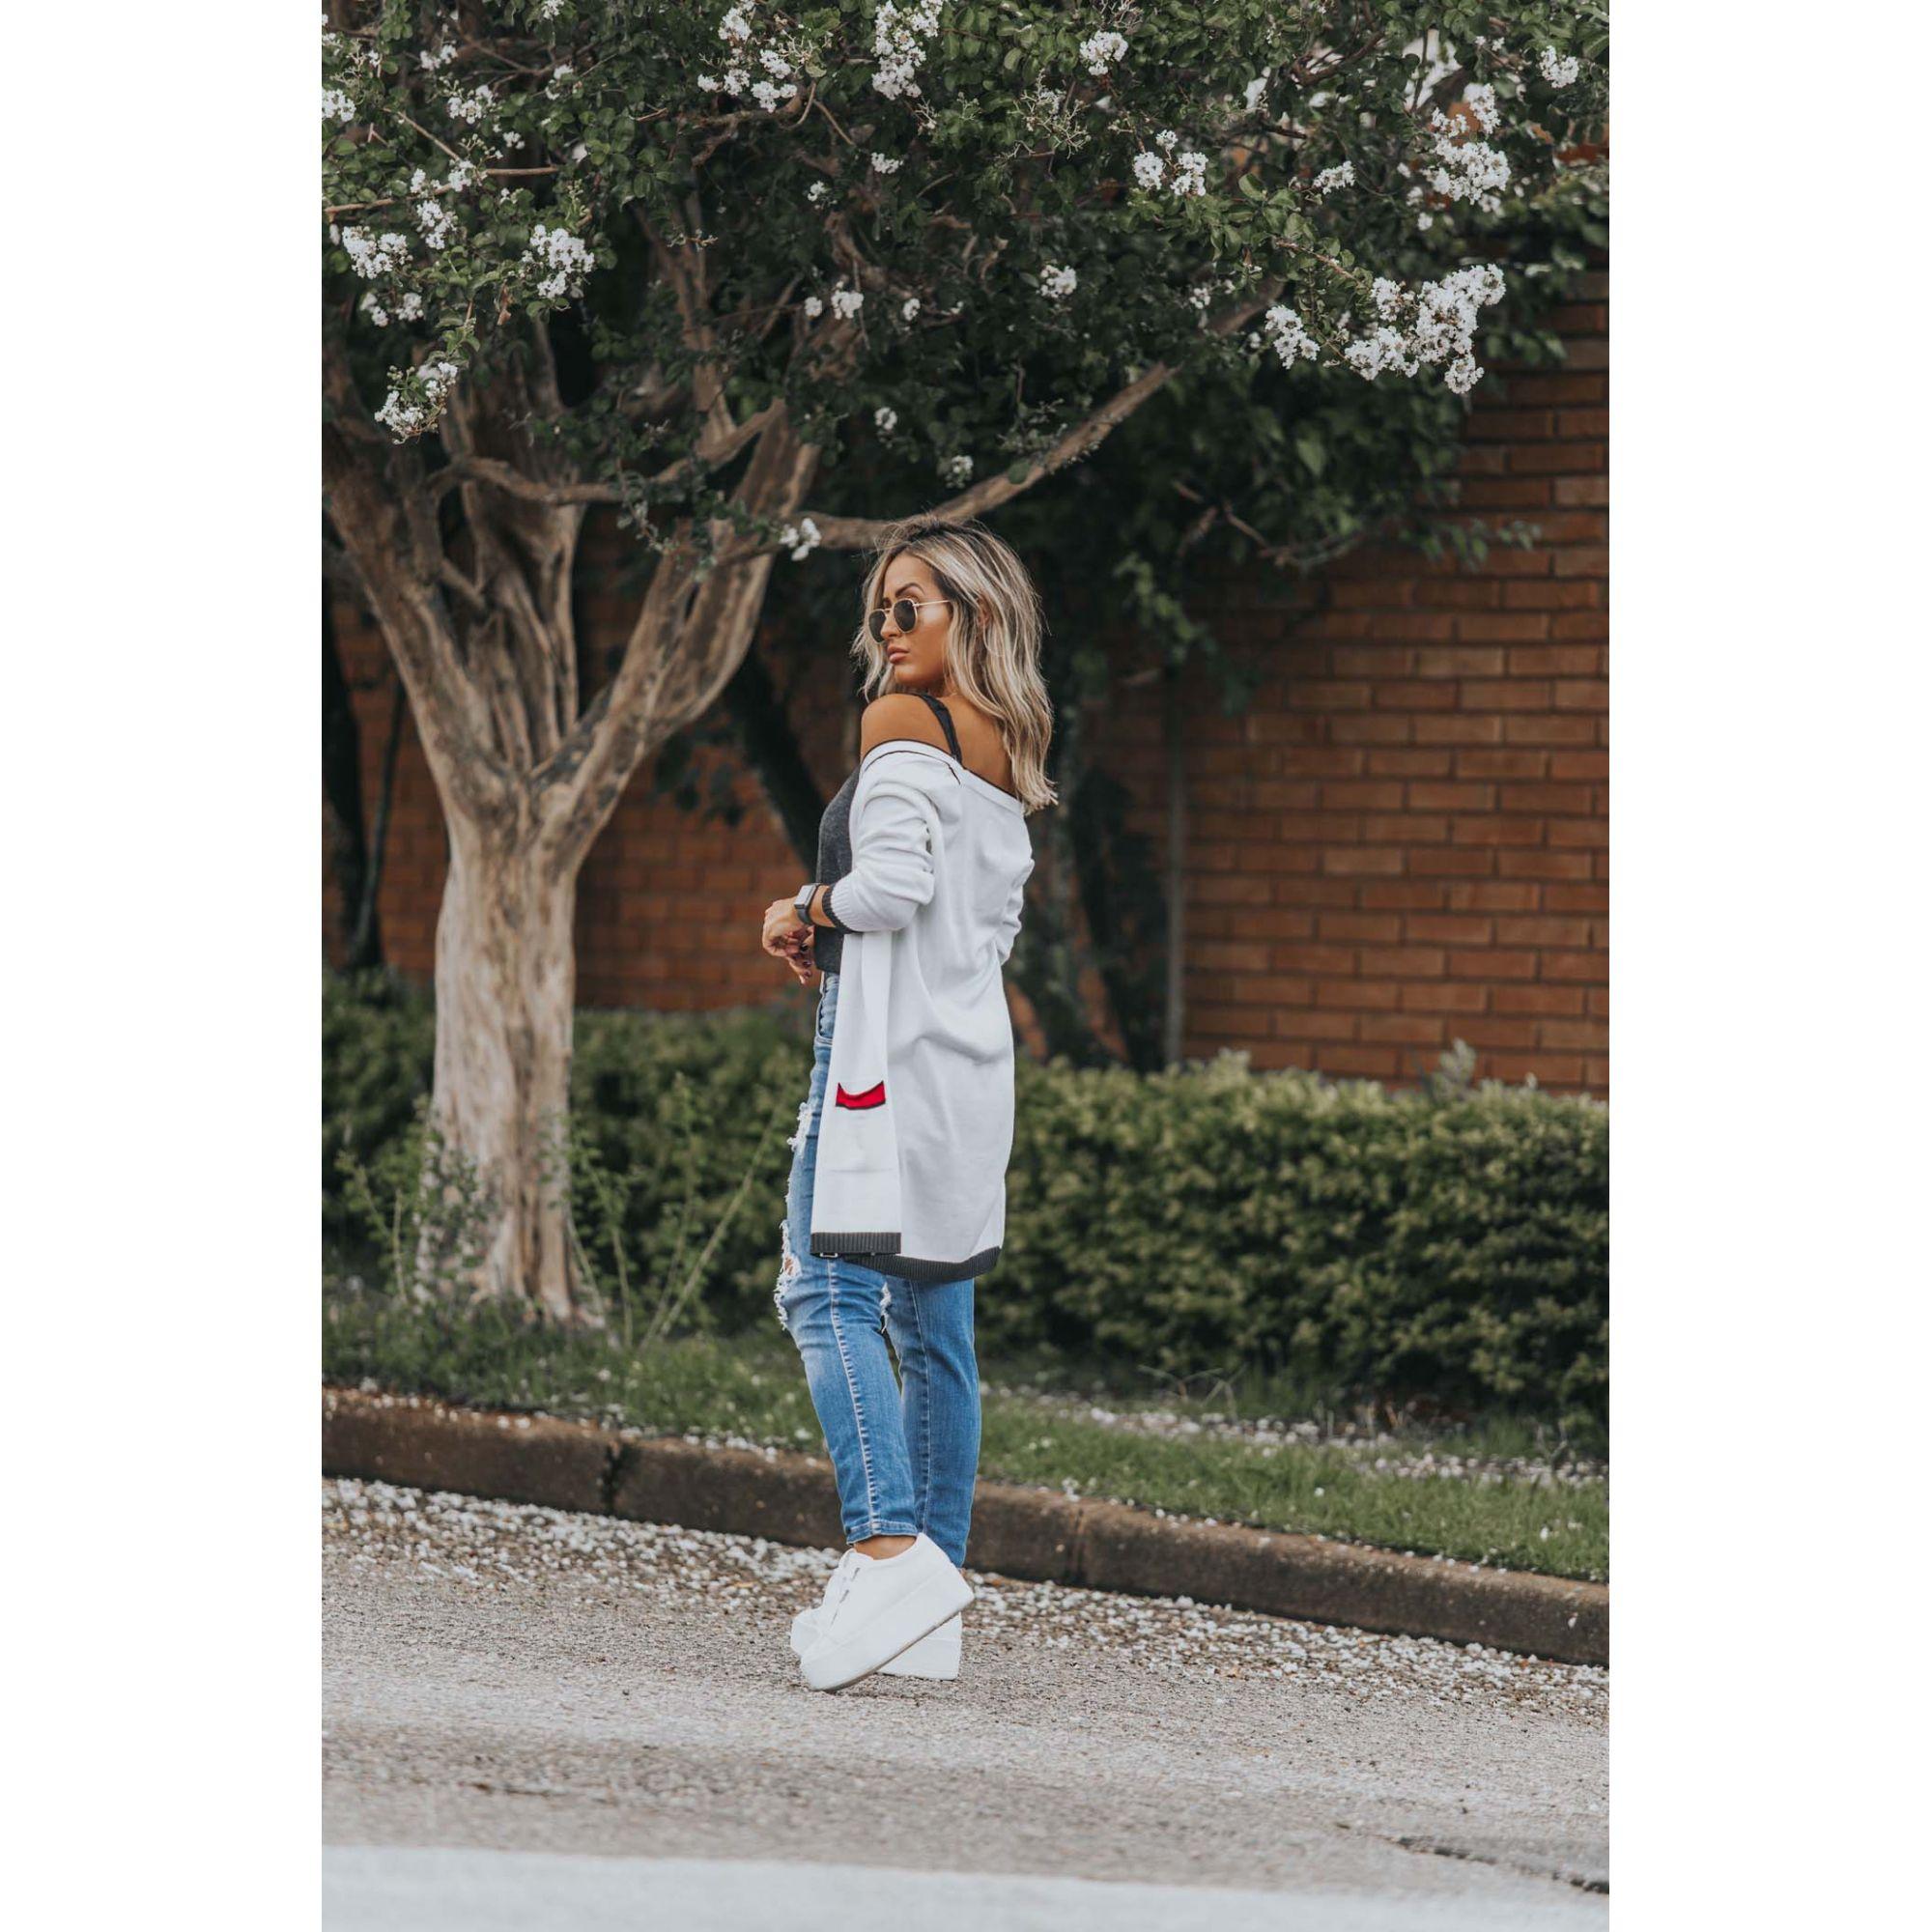 Casaco Vera Tricot Bolsos Listras Feminino Branco / Preto / Vermelho